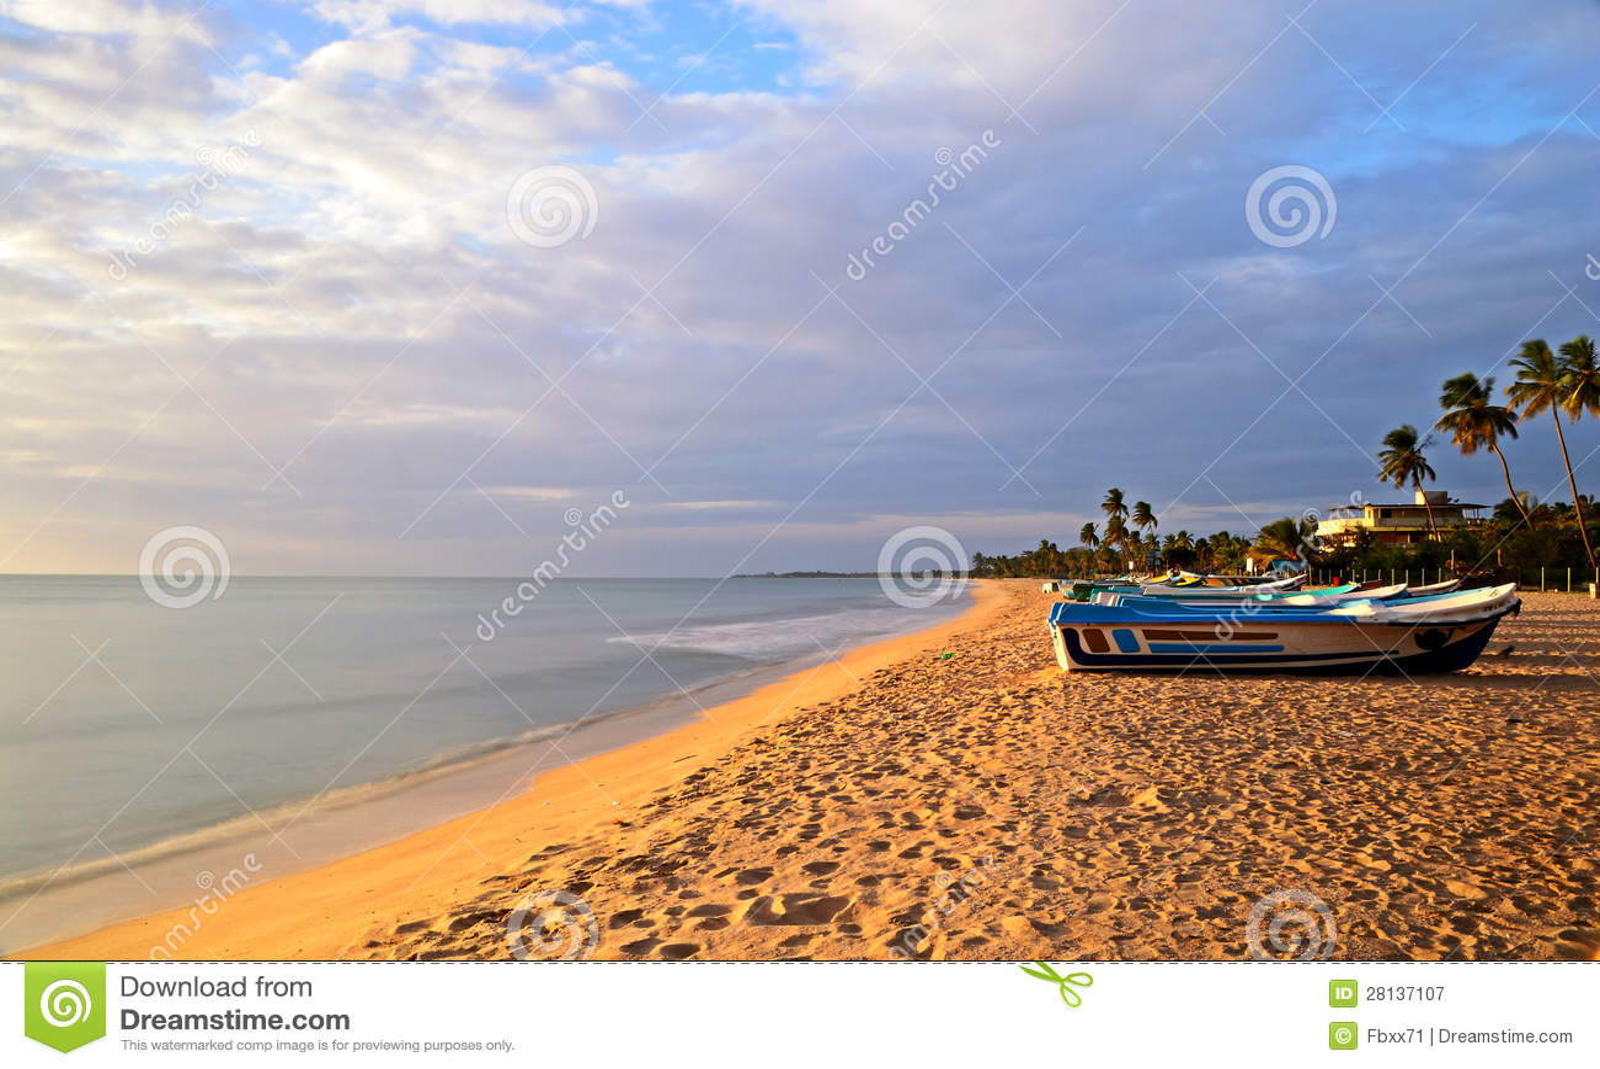 Nilaveli beach and Pigeon Island